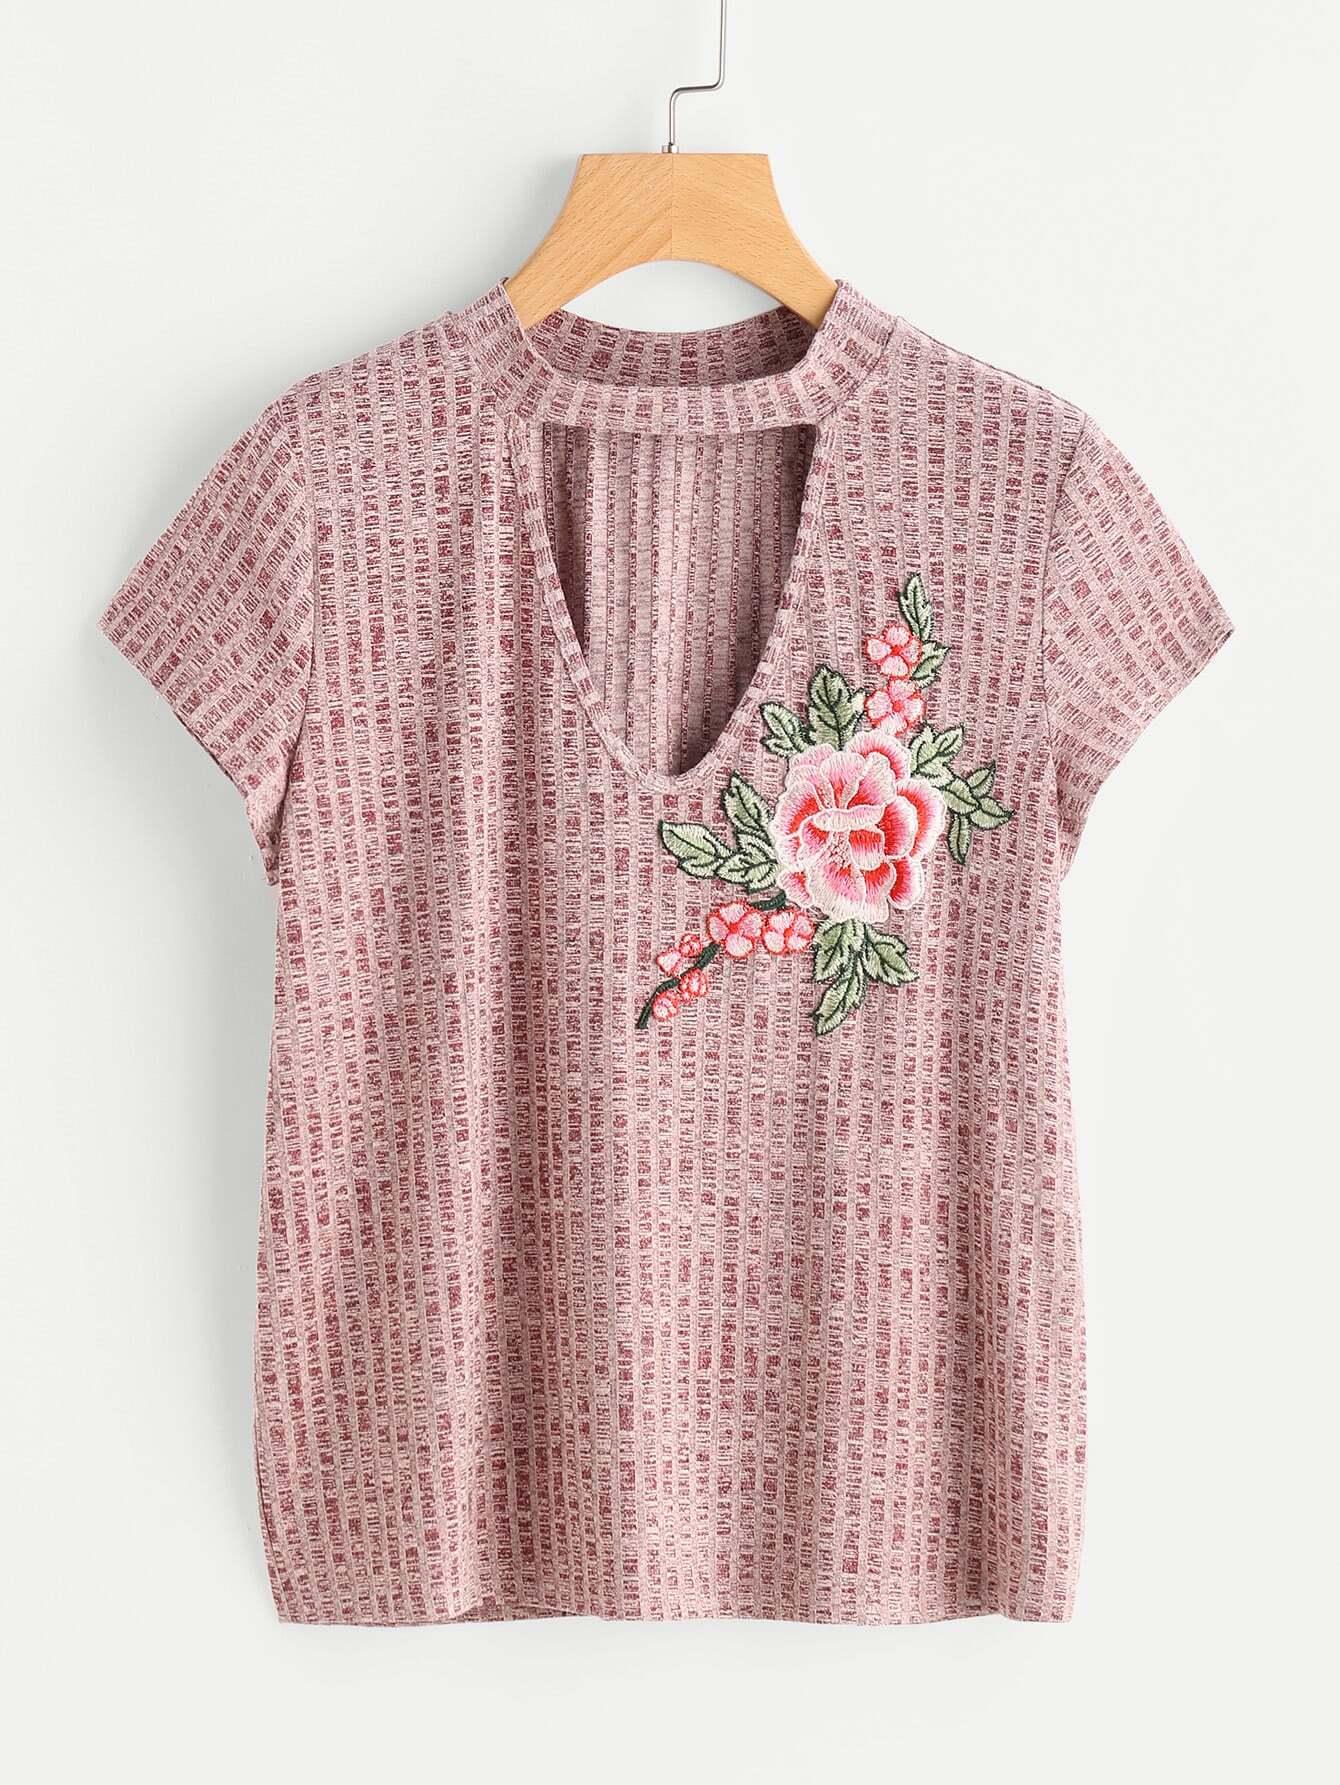 Rib Knit Flower Applique Choker Neck Tee tee170630701